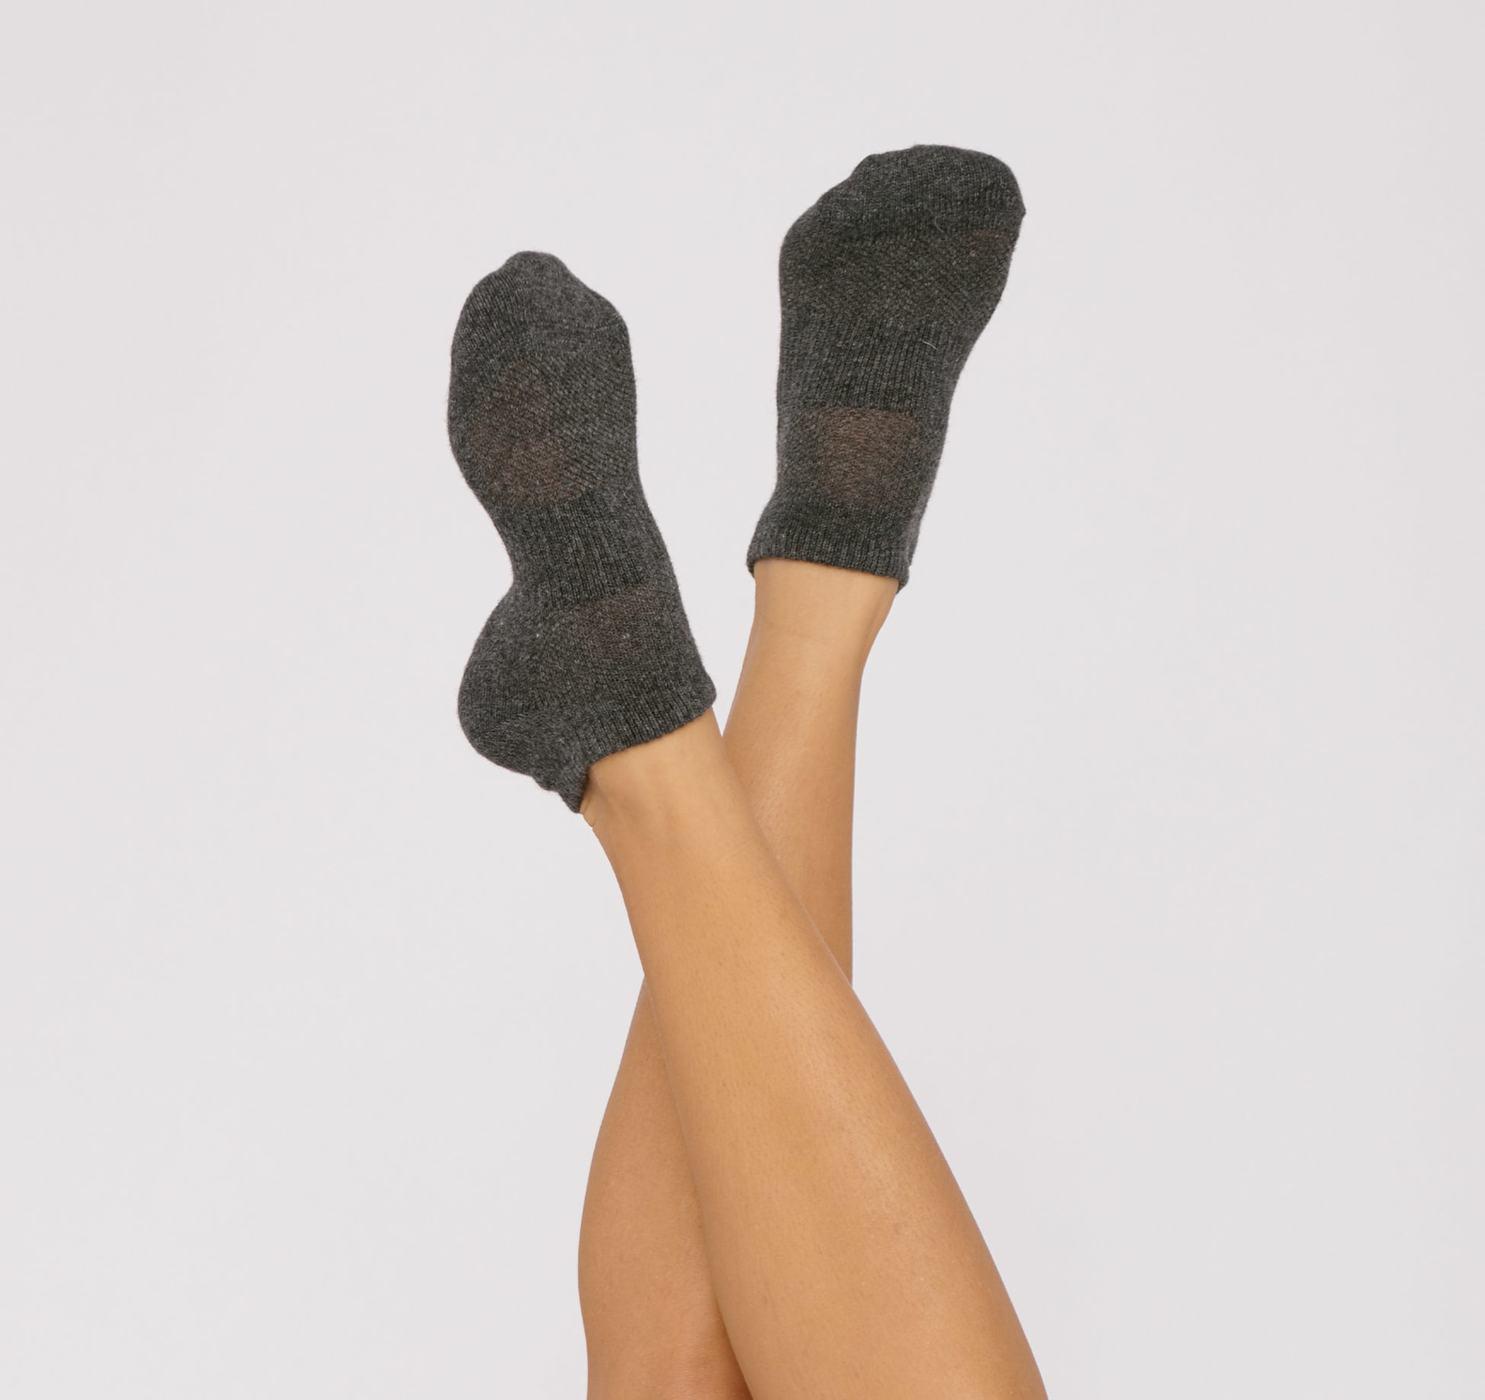 SilverTech™ Active Ankle Socks